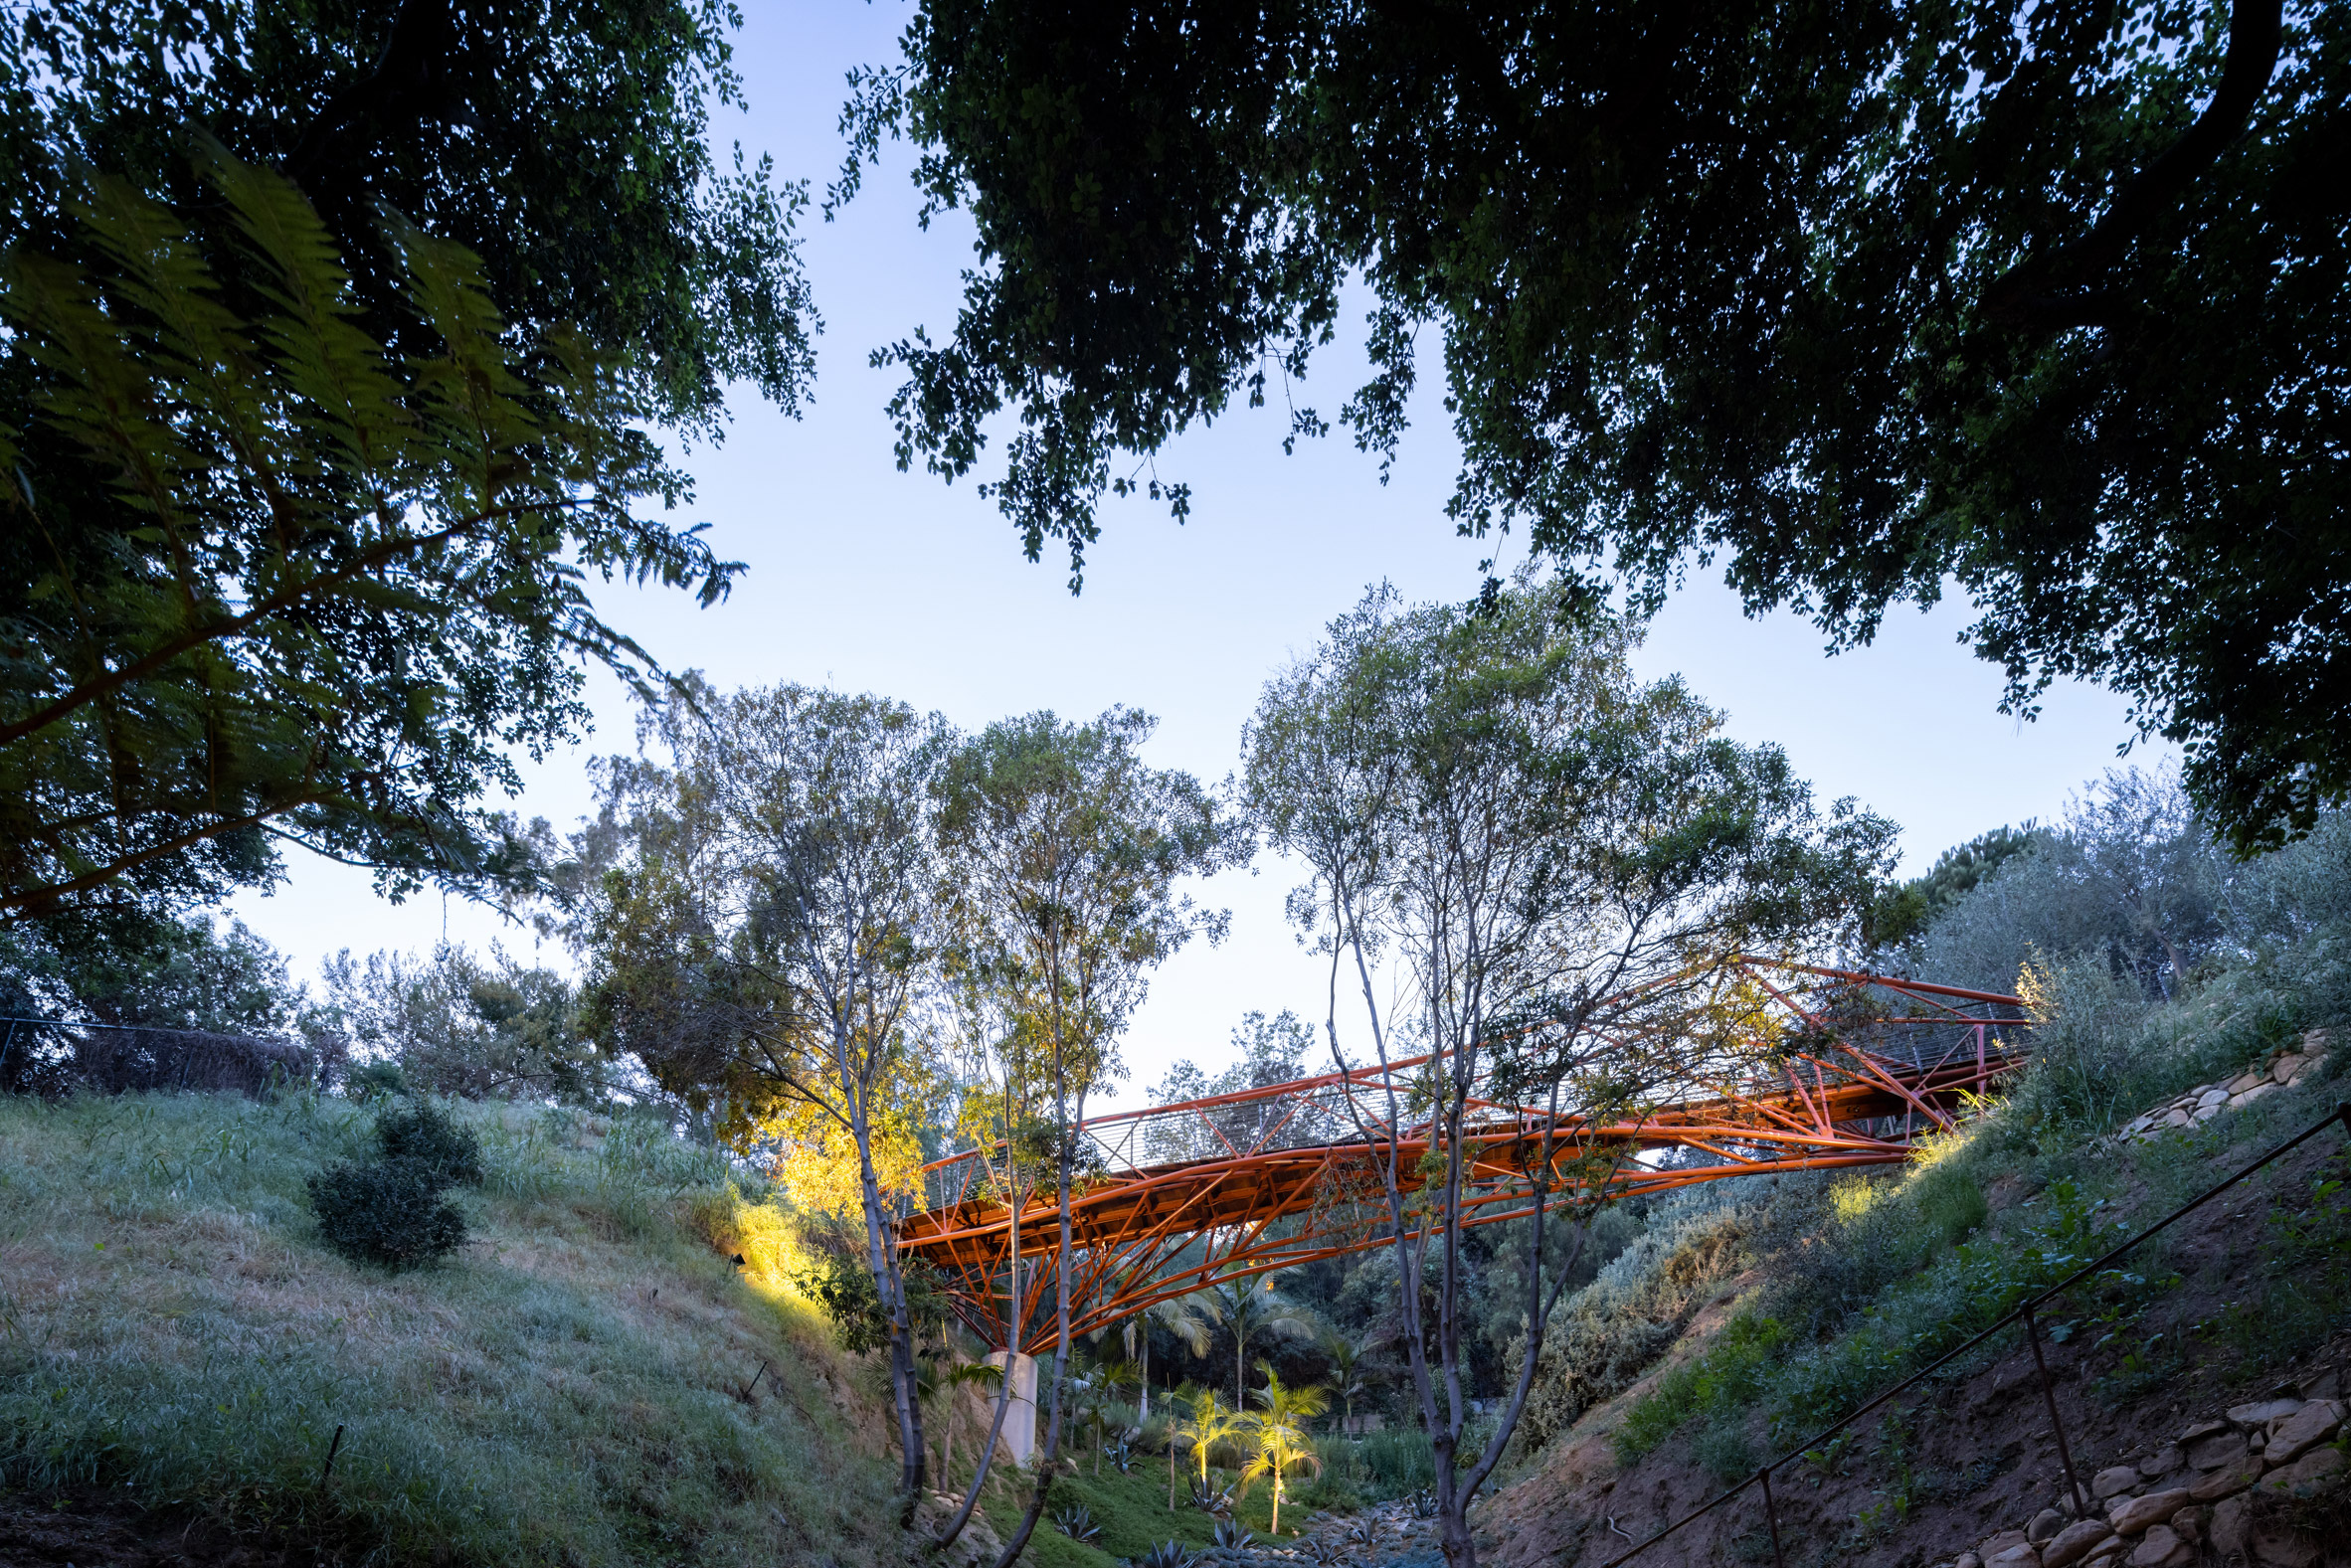 Arroyo Bridge lit up at dusk